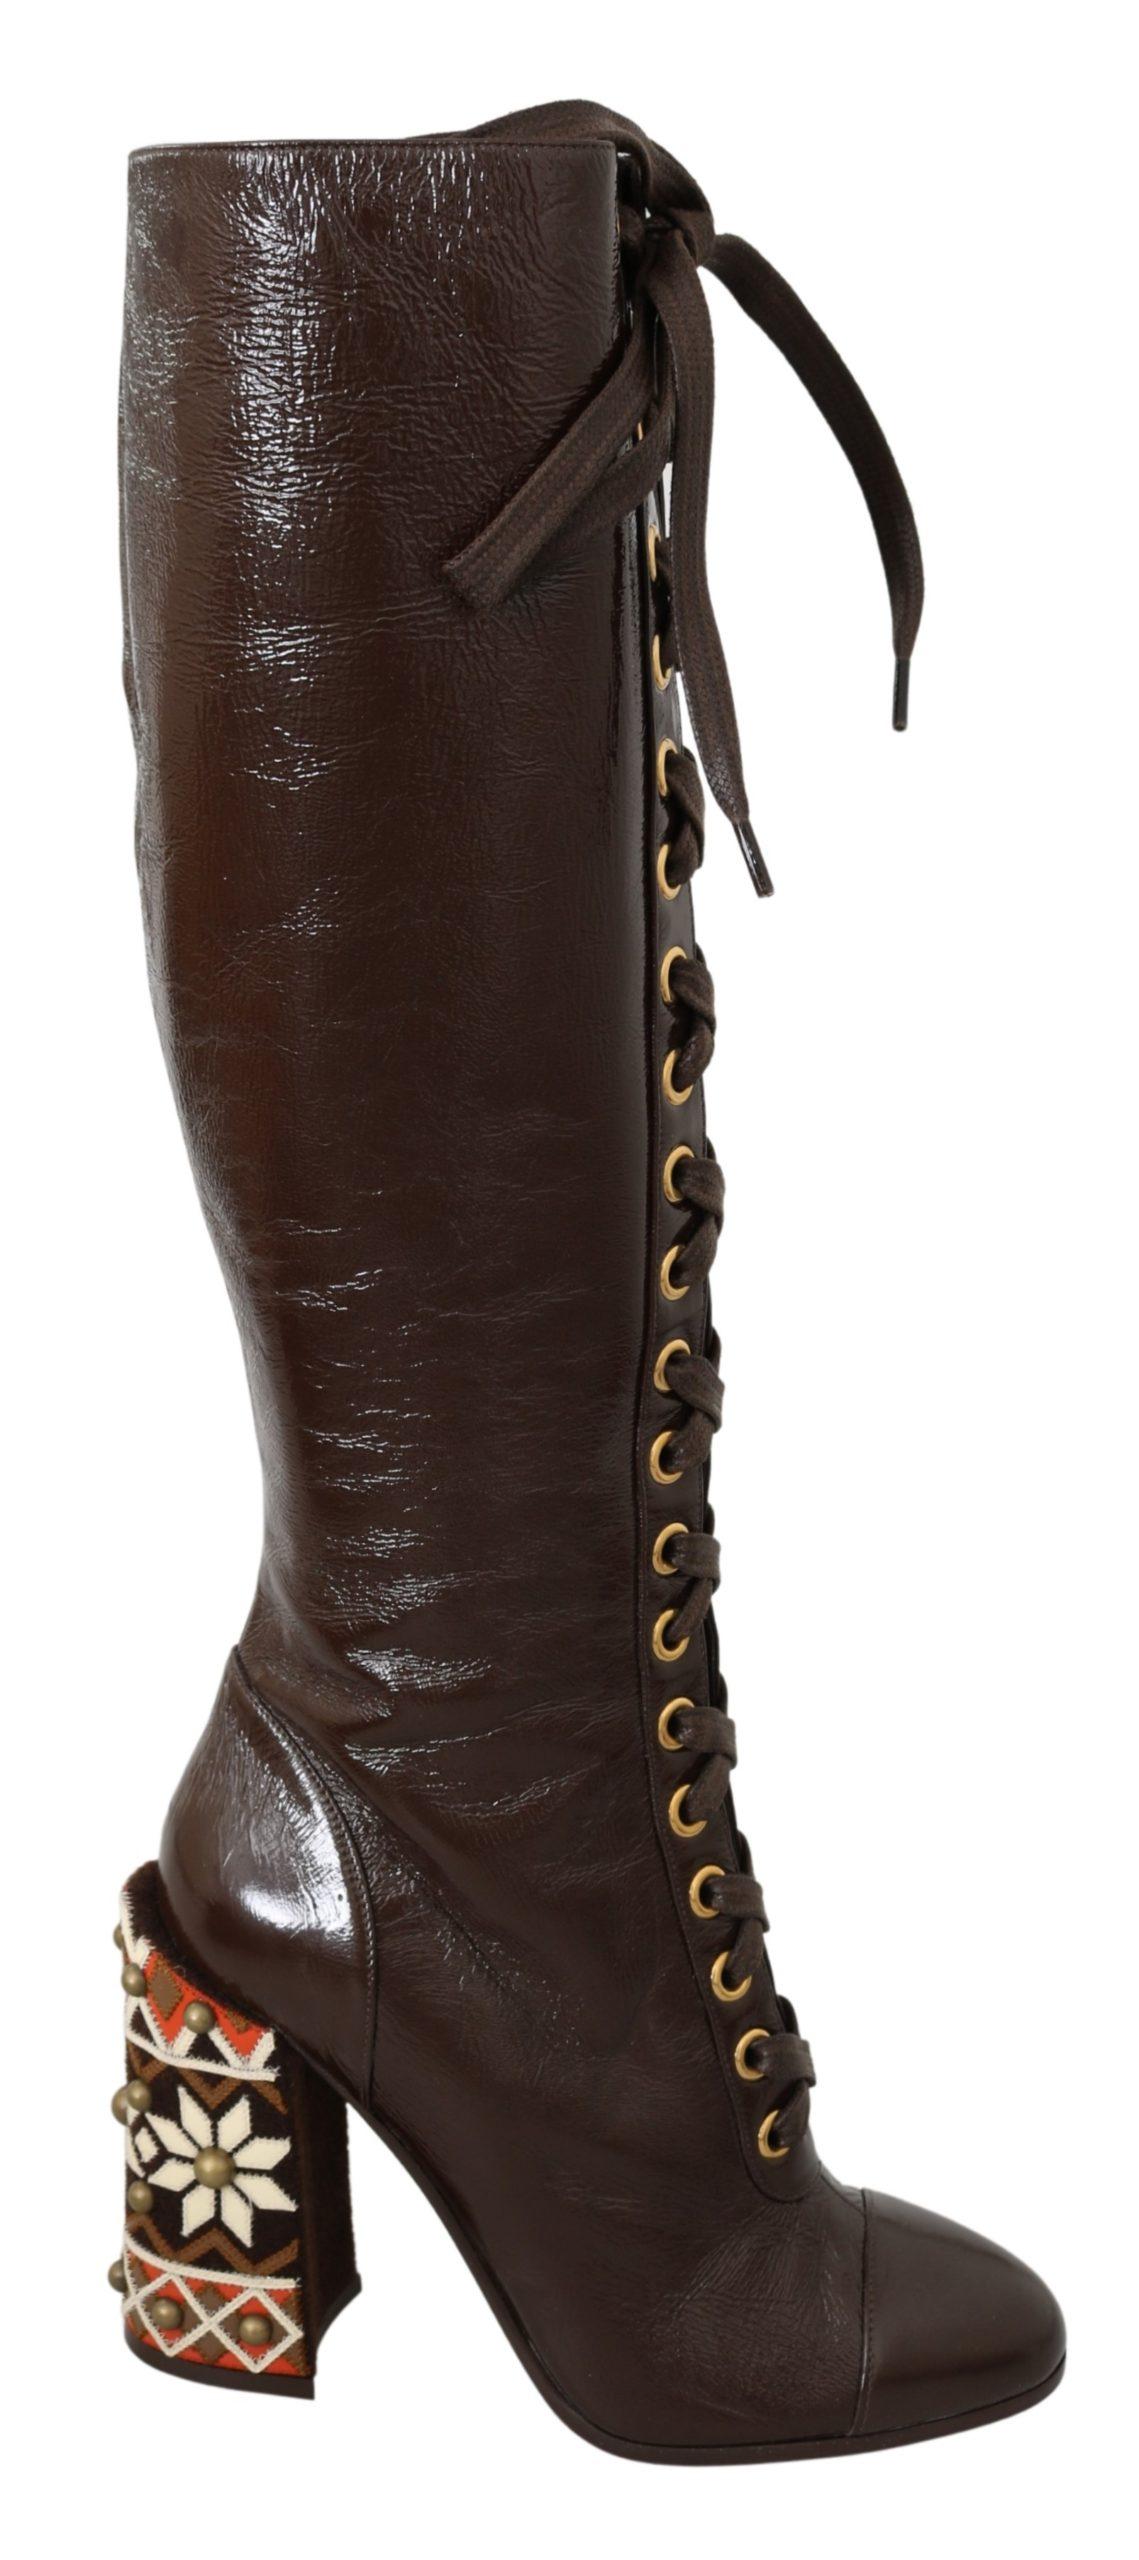 Dolce & Gabbana Women's Leather Knee High Boot Brown LA7089 - EU39/US8.5